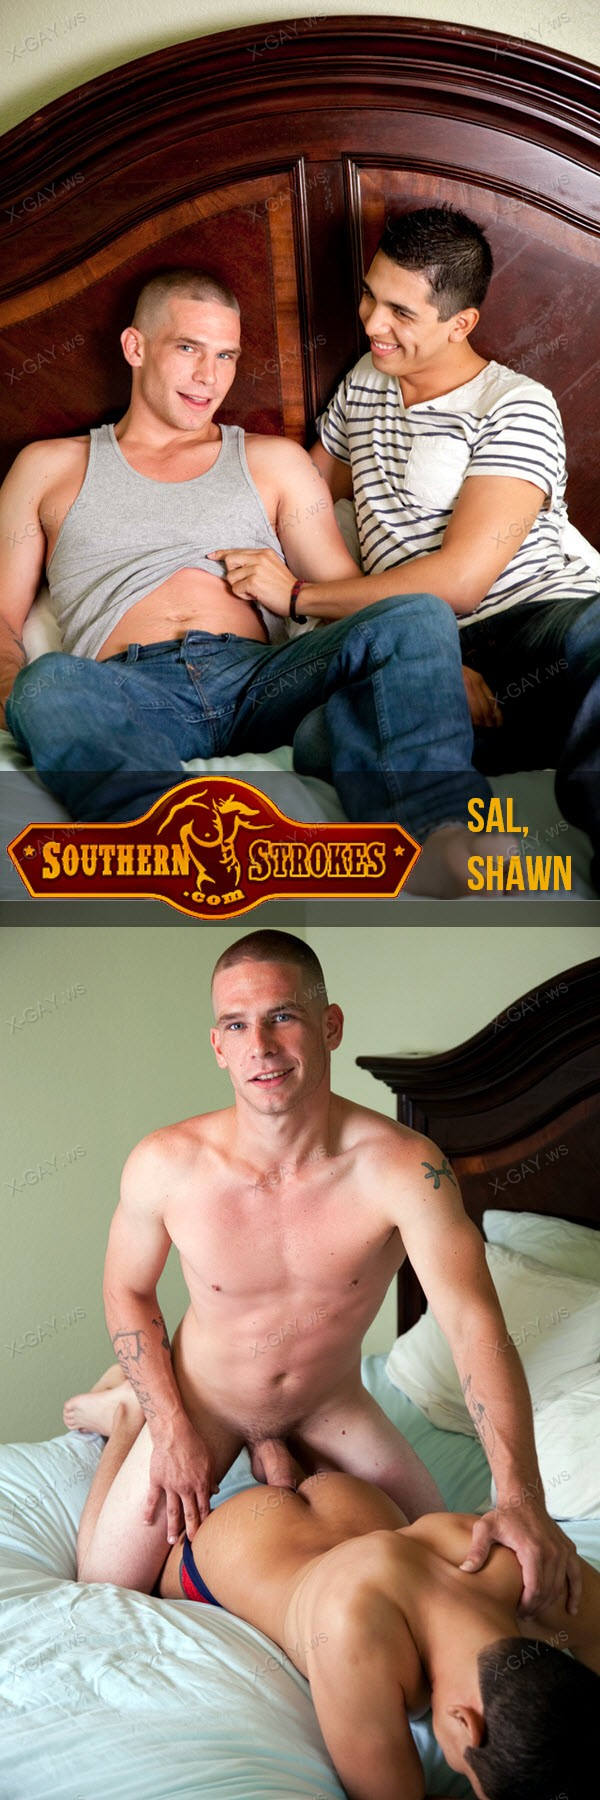 southernstrokes_salshawn.jpg